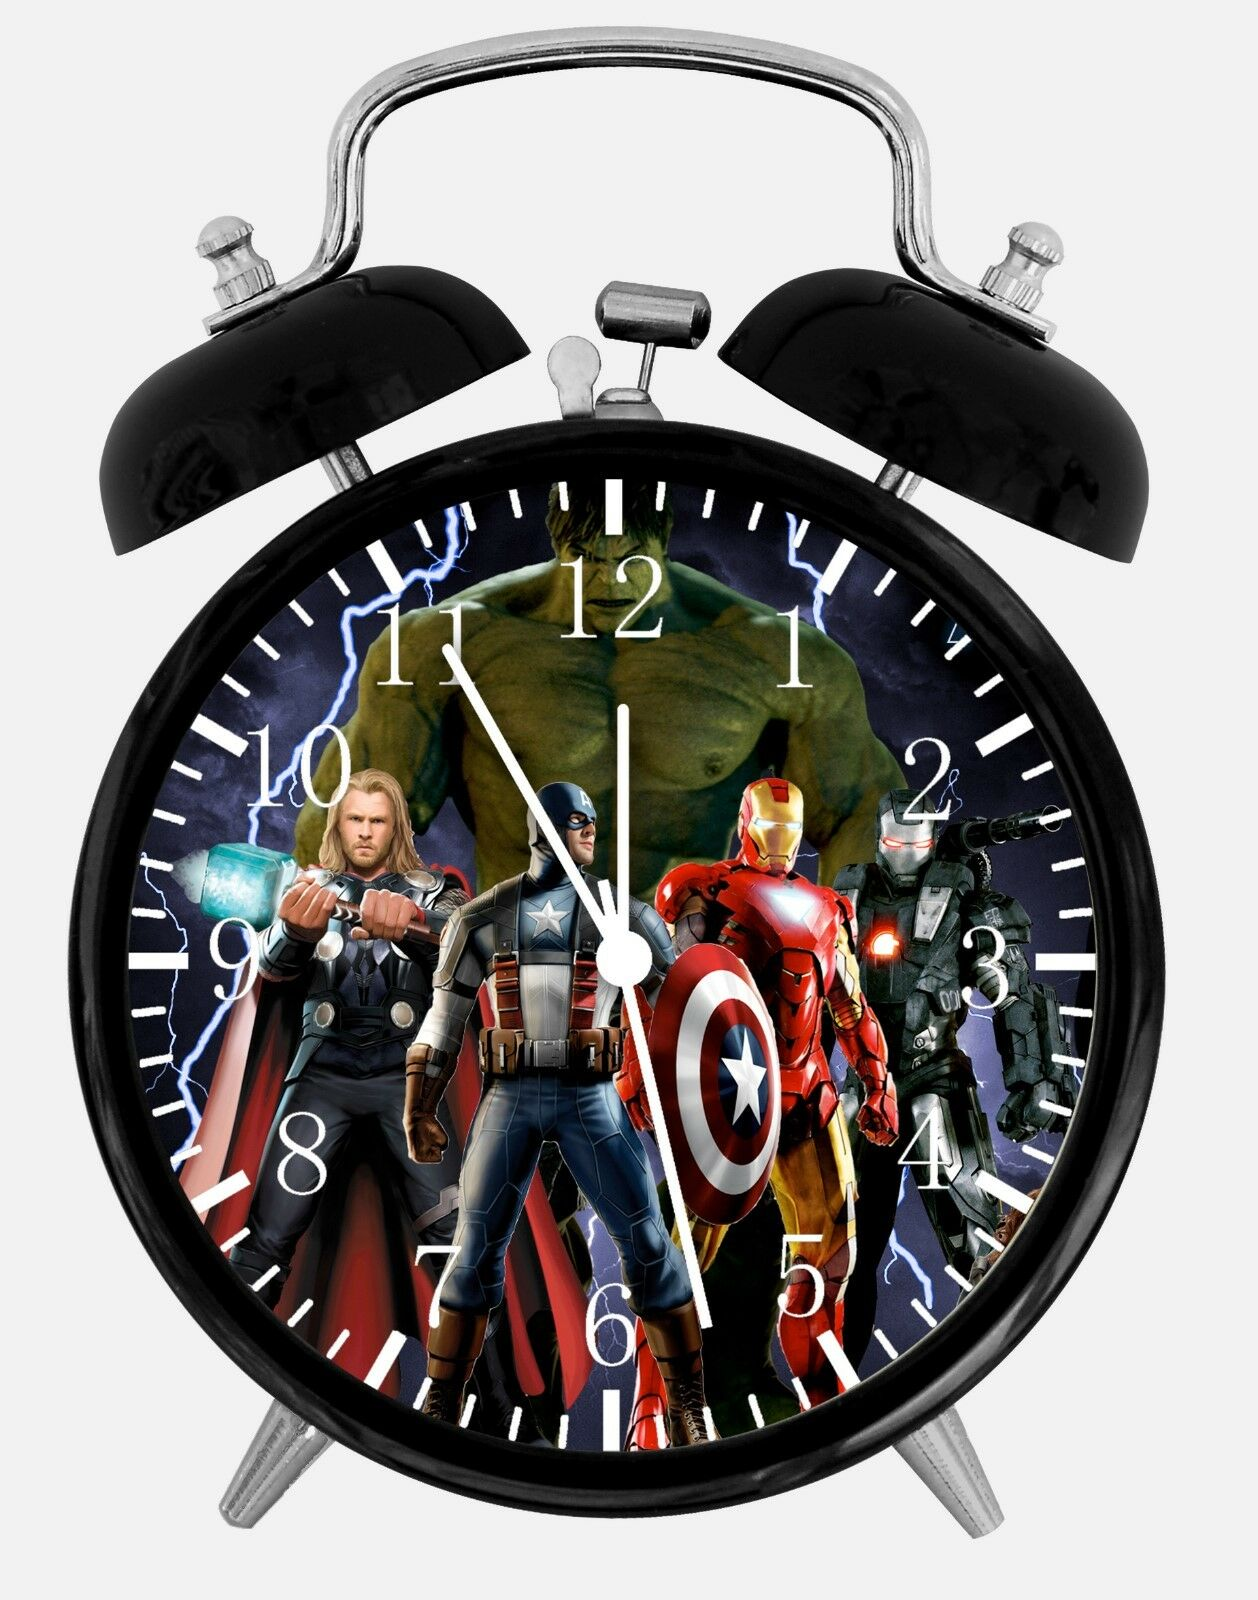 "The Avengers Alarm Desk Clock 3.75"" Room Office Decor E44 A Nice Gift"